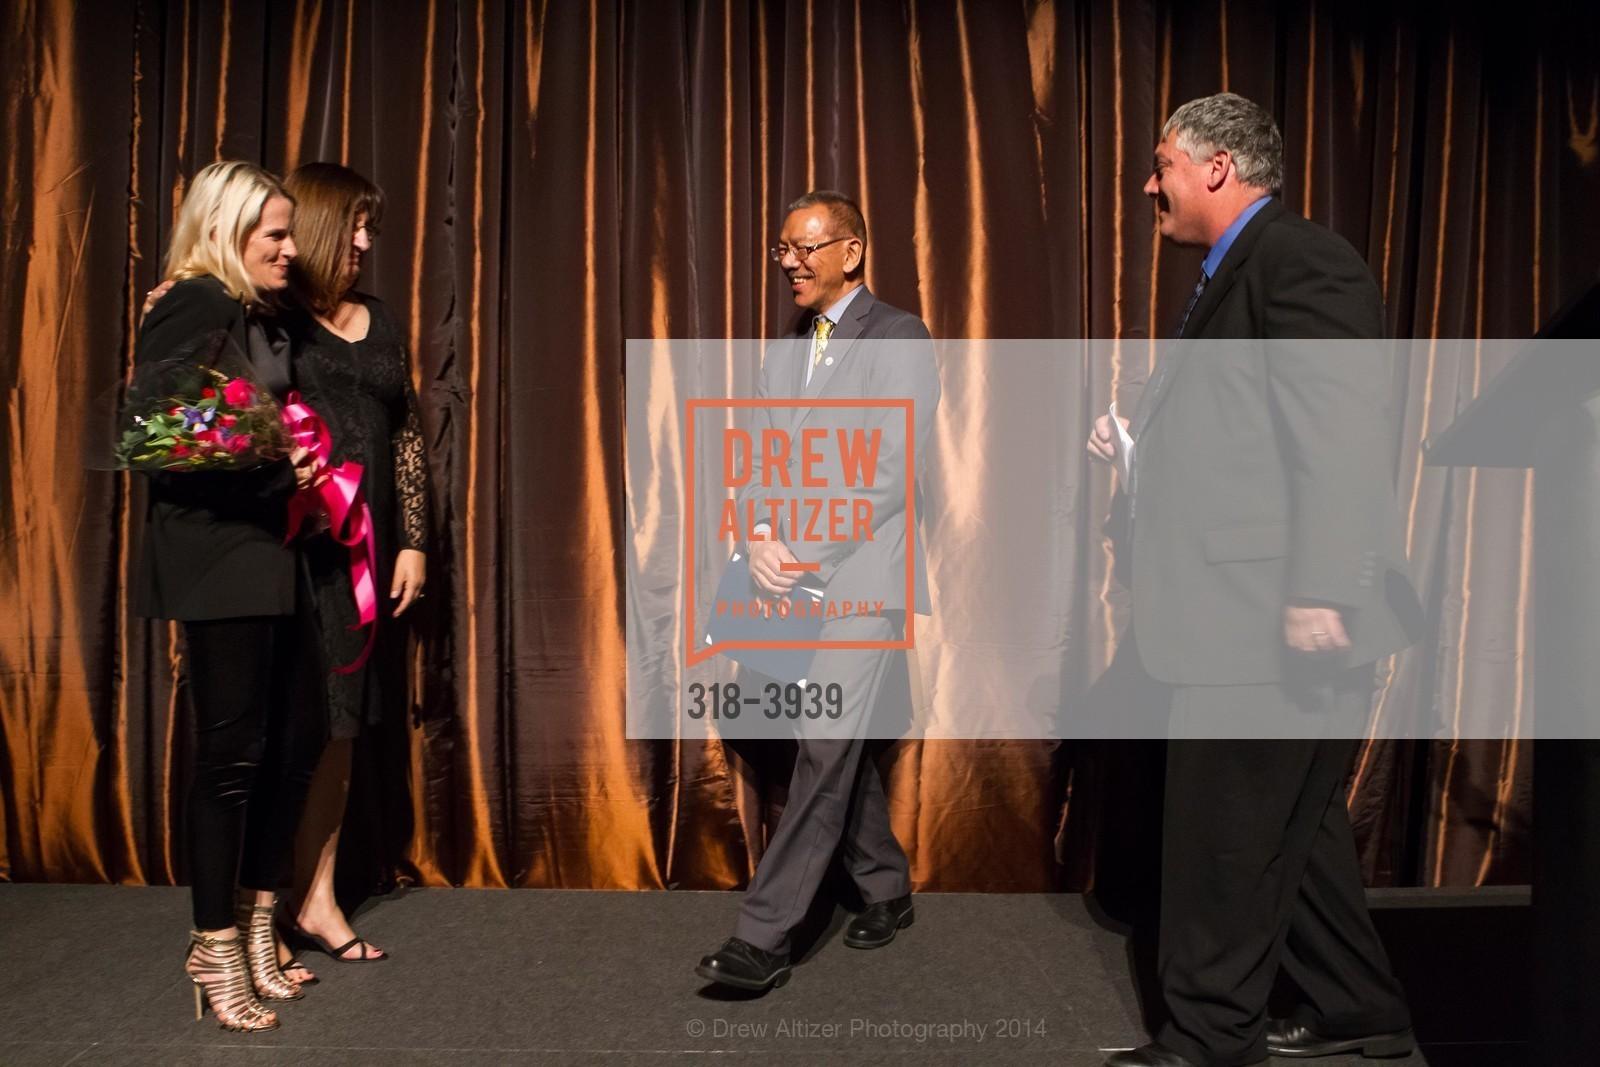 Marie Hurabiell, Donna Cahill, Supervisor Norman Yee, Tom Oertl, Photo #318-3939